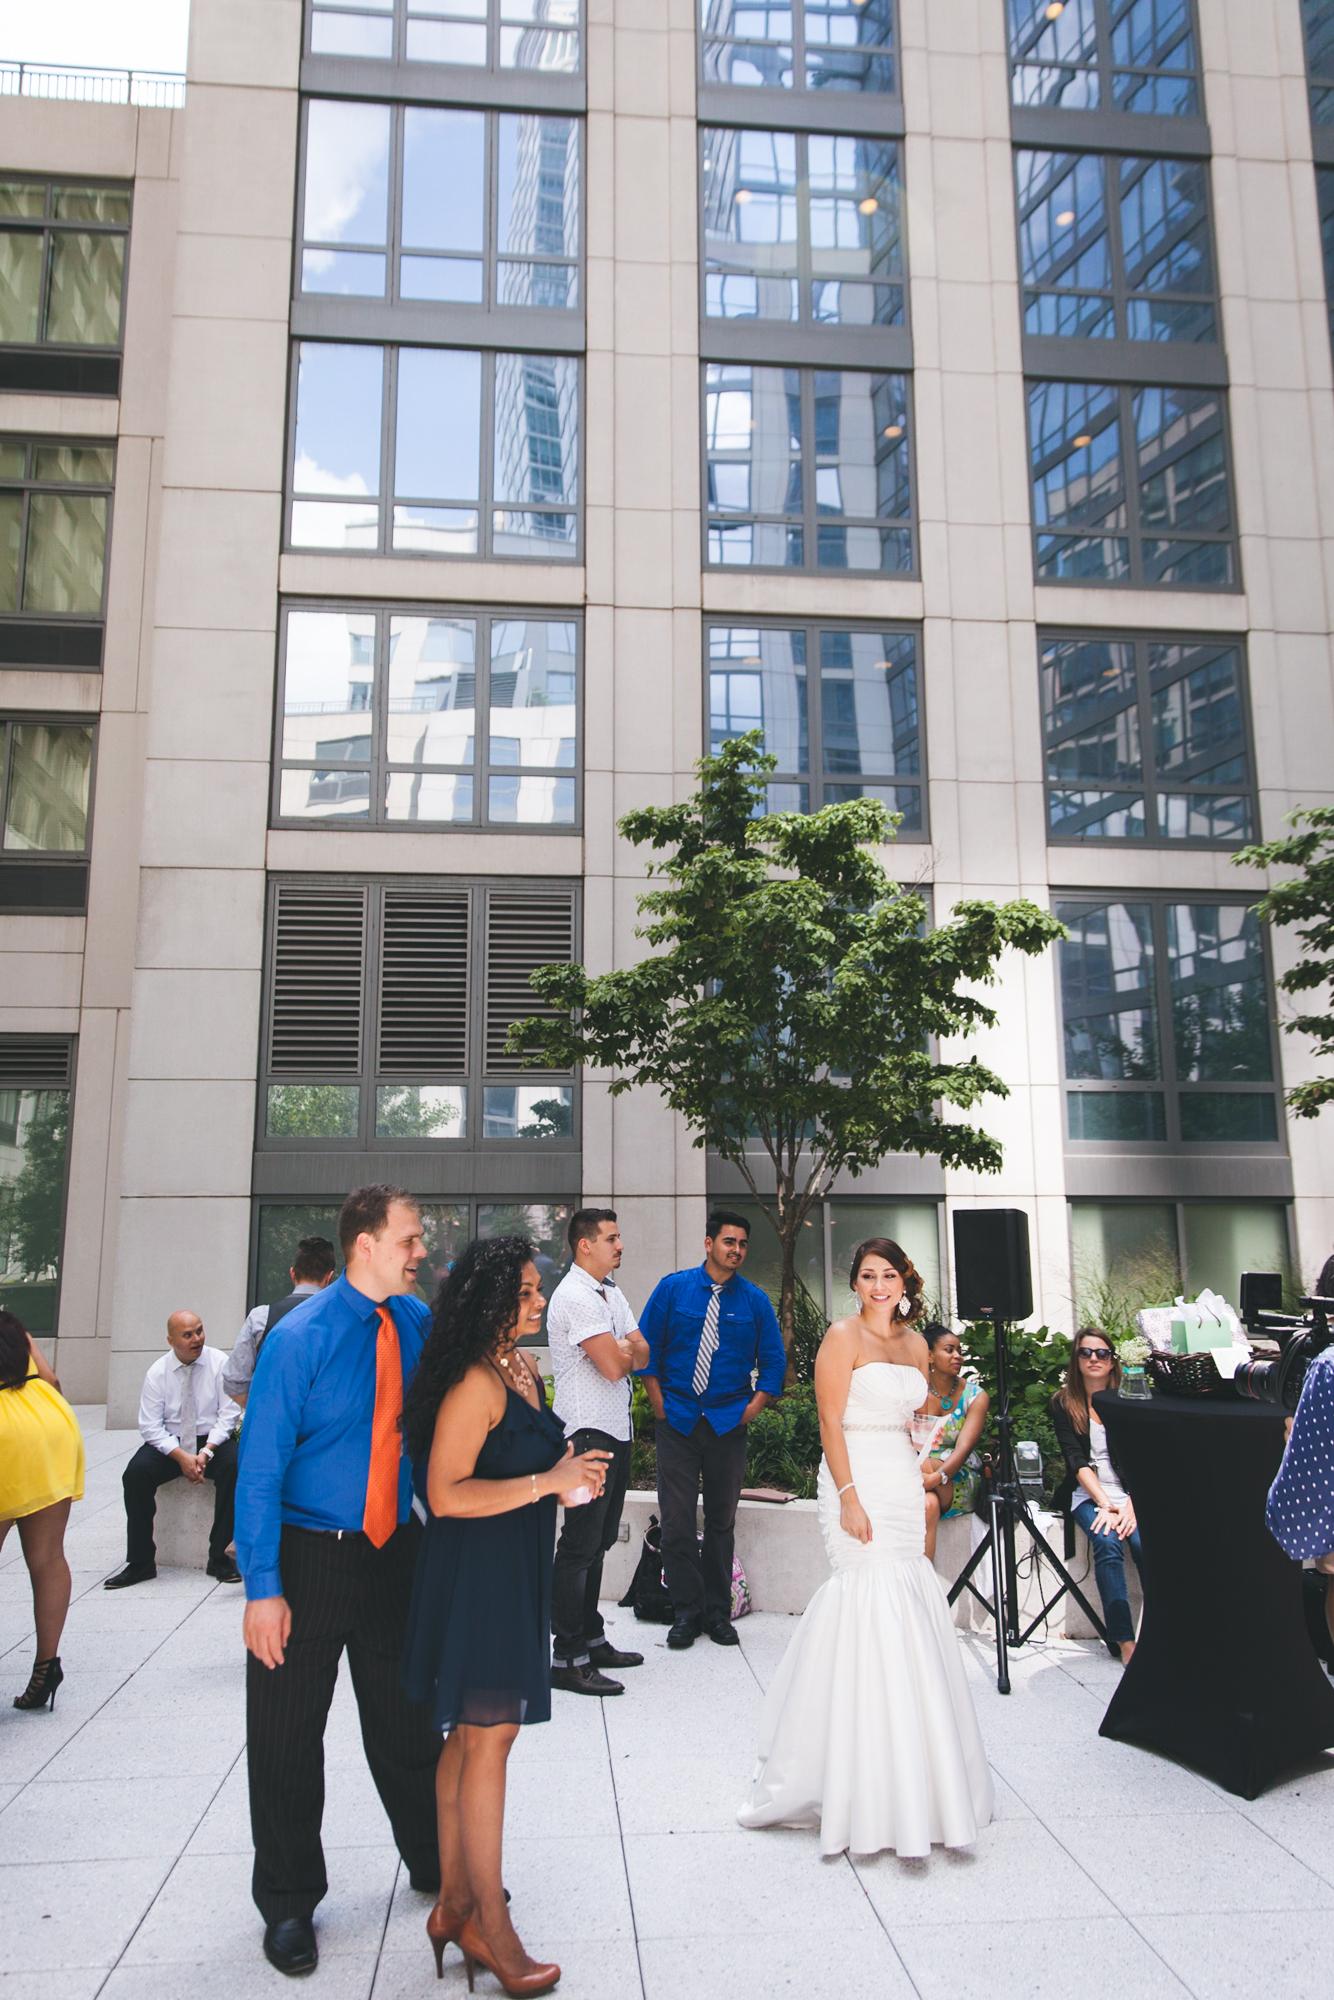 PriscillaJeffrey-Central-Park-Wedding-Elopement-Photography-NYC-50.jpg